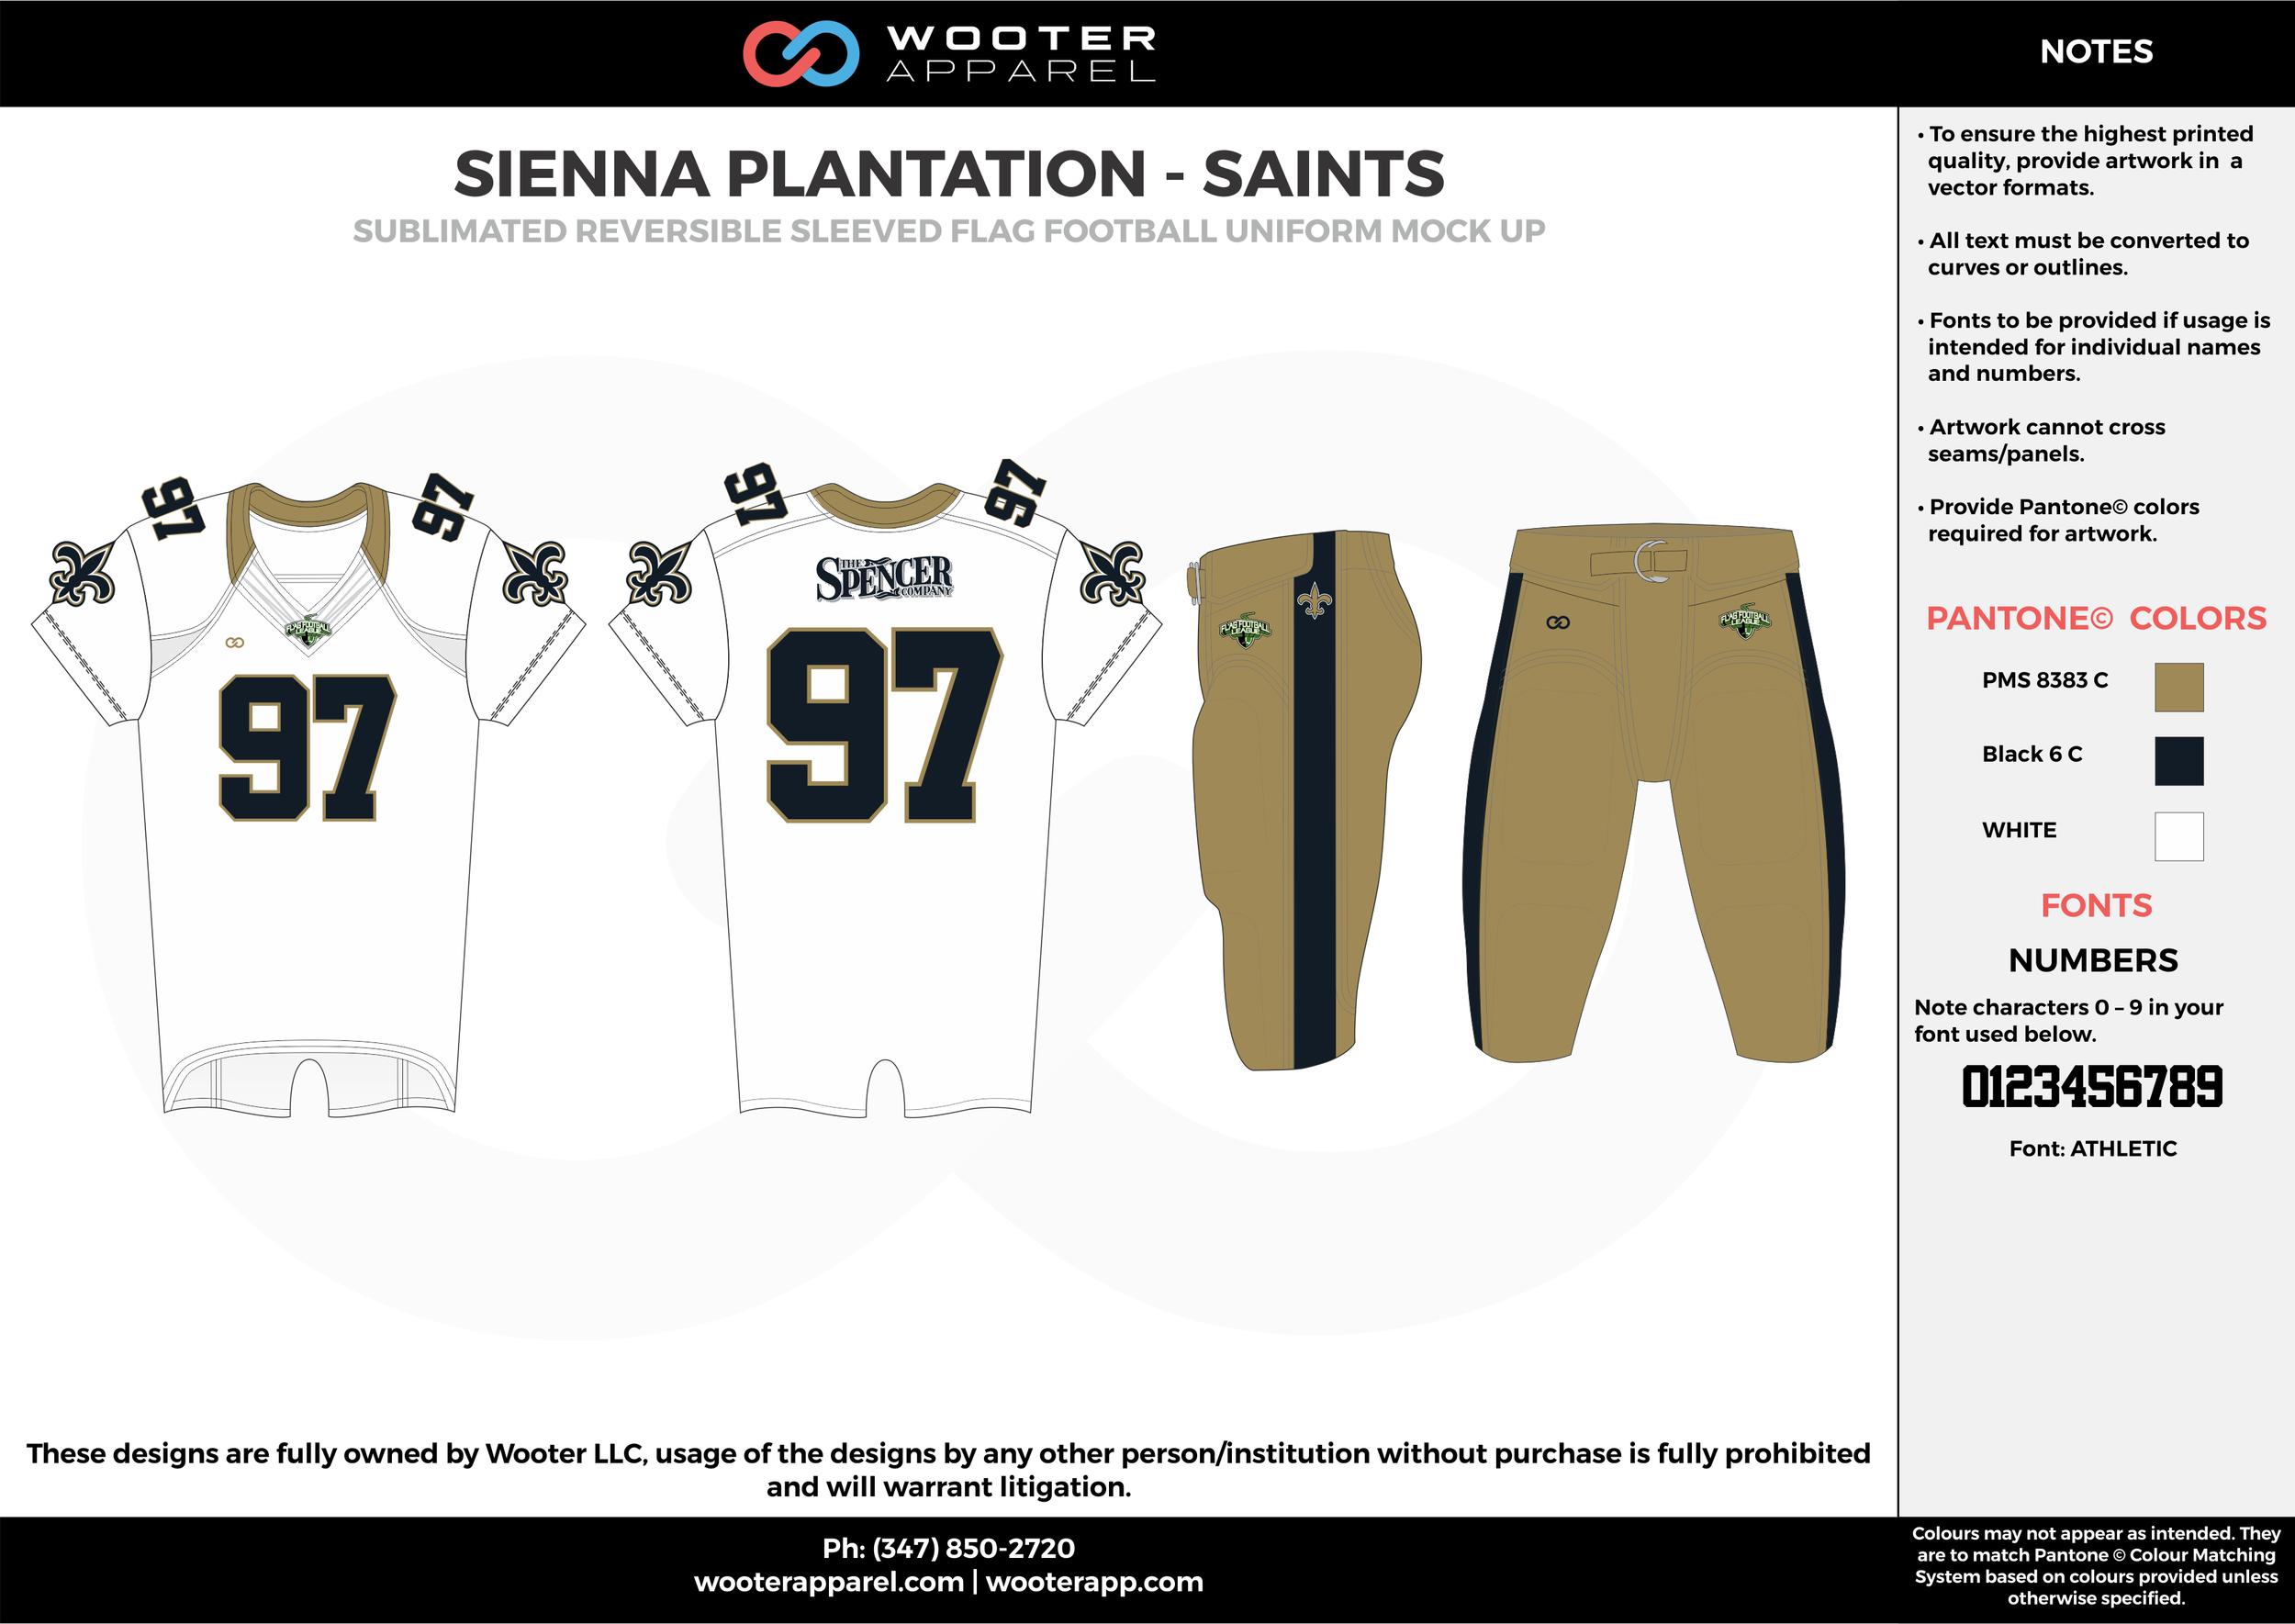 SIENNA PLANTATION - SAINTS khaki black white Football Uniform, Jersey, Pants, Integraded